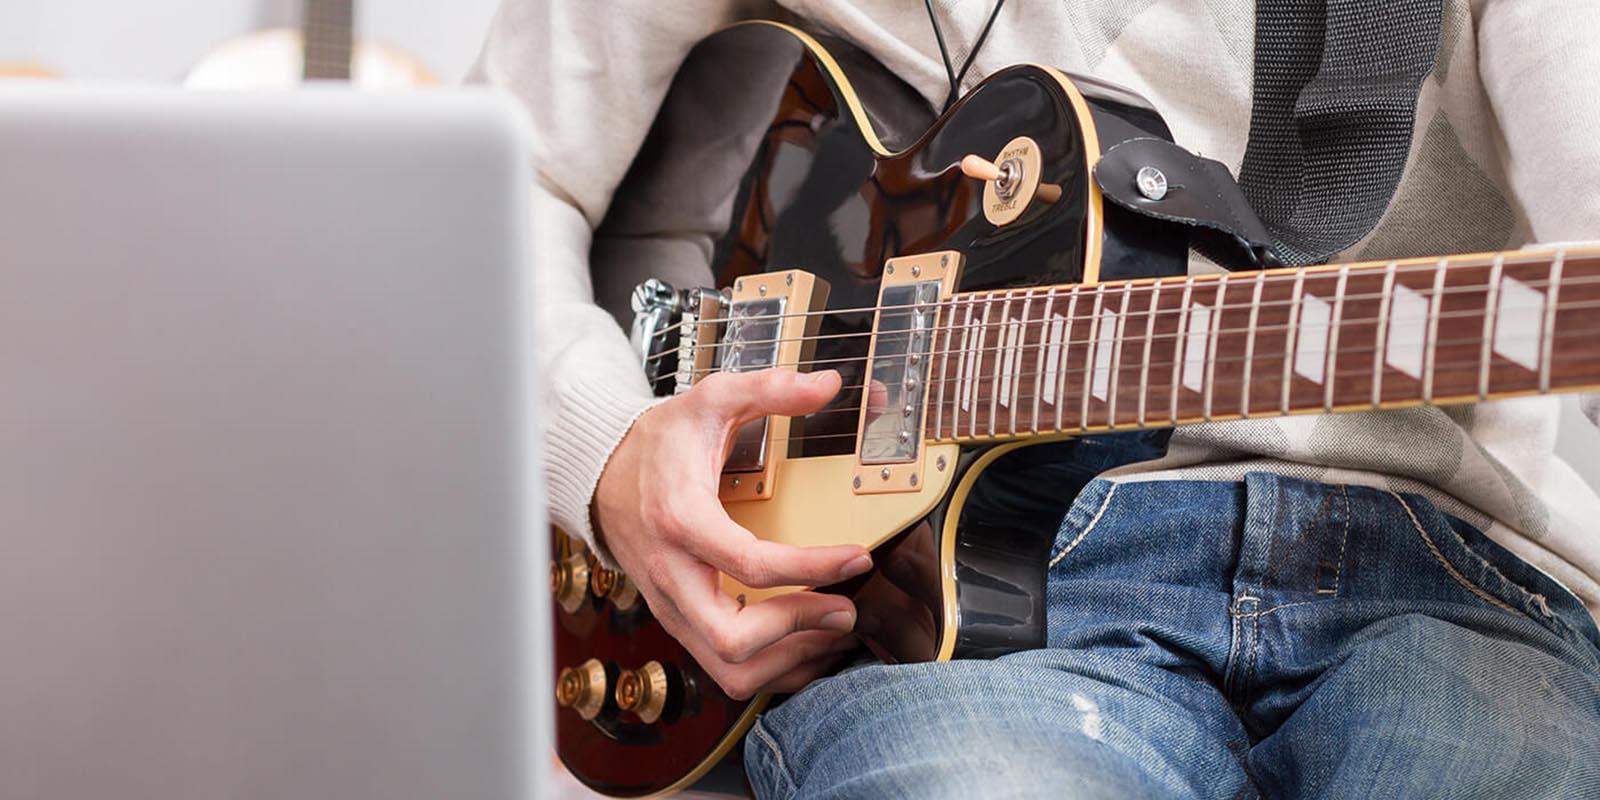 Tocar instrumentos musicales YouTube